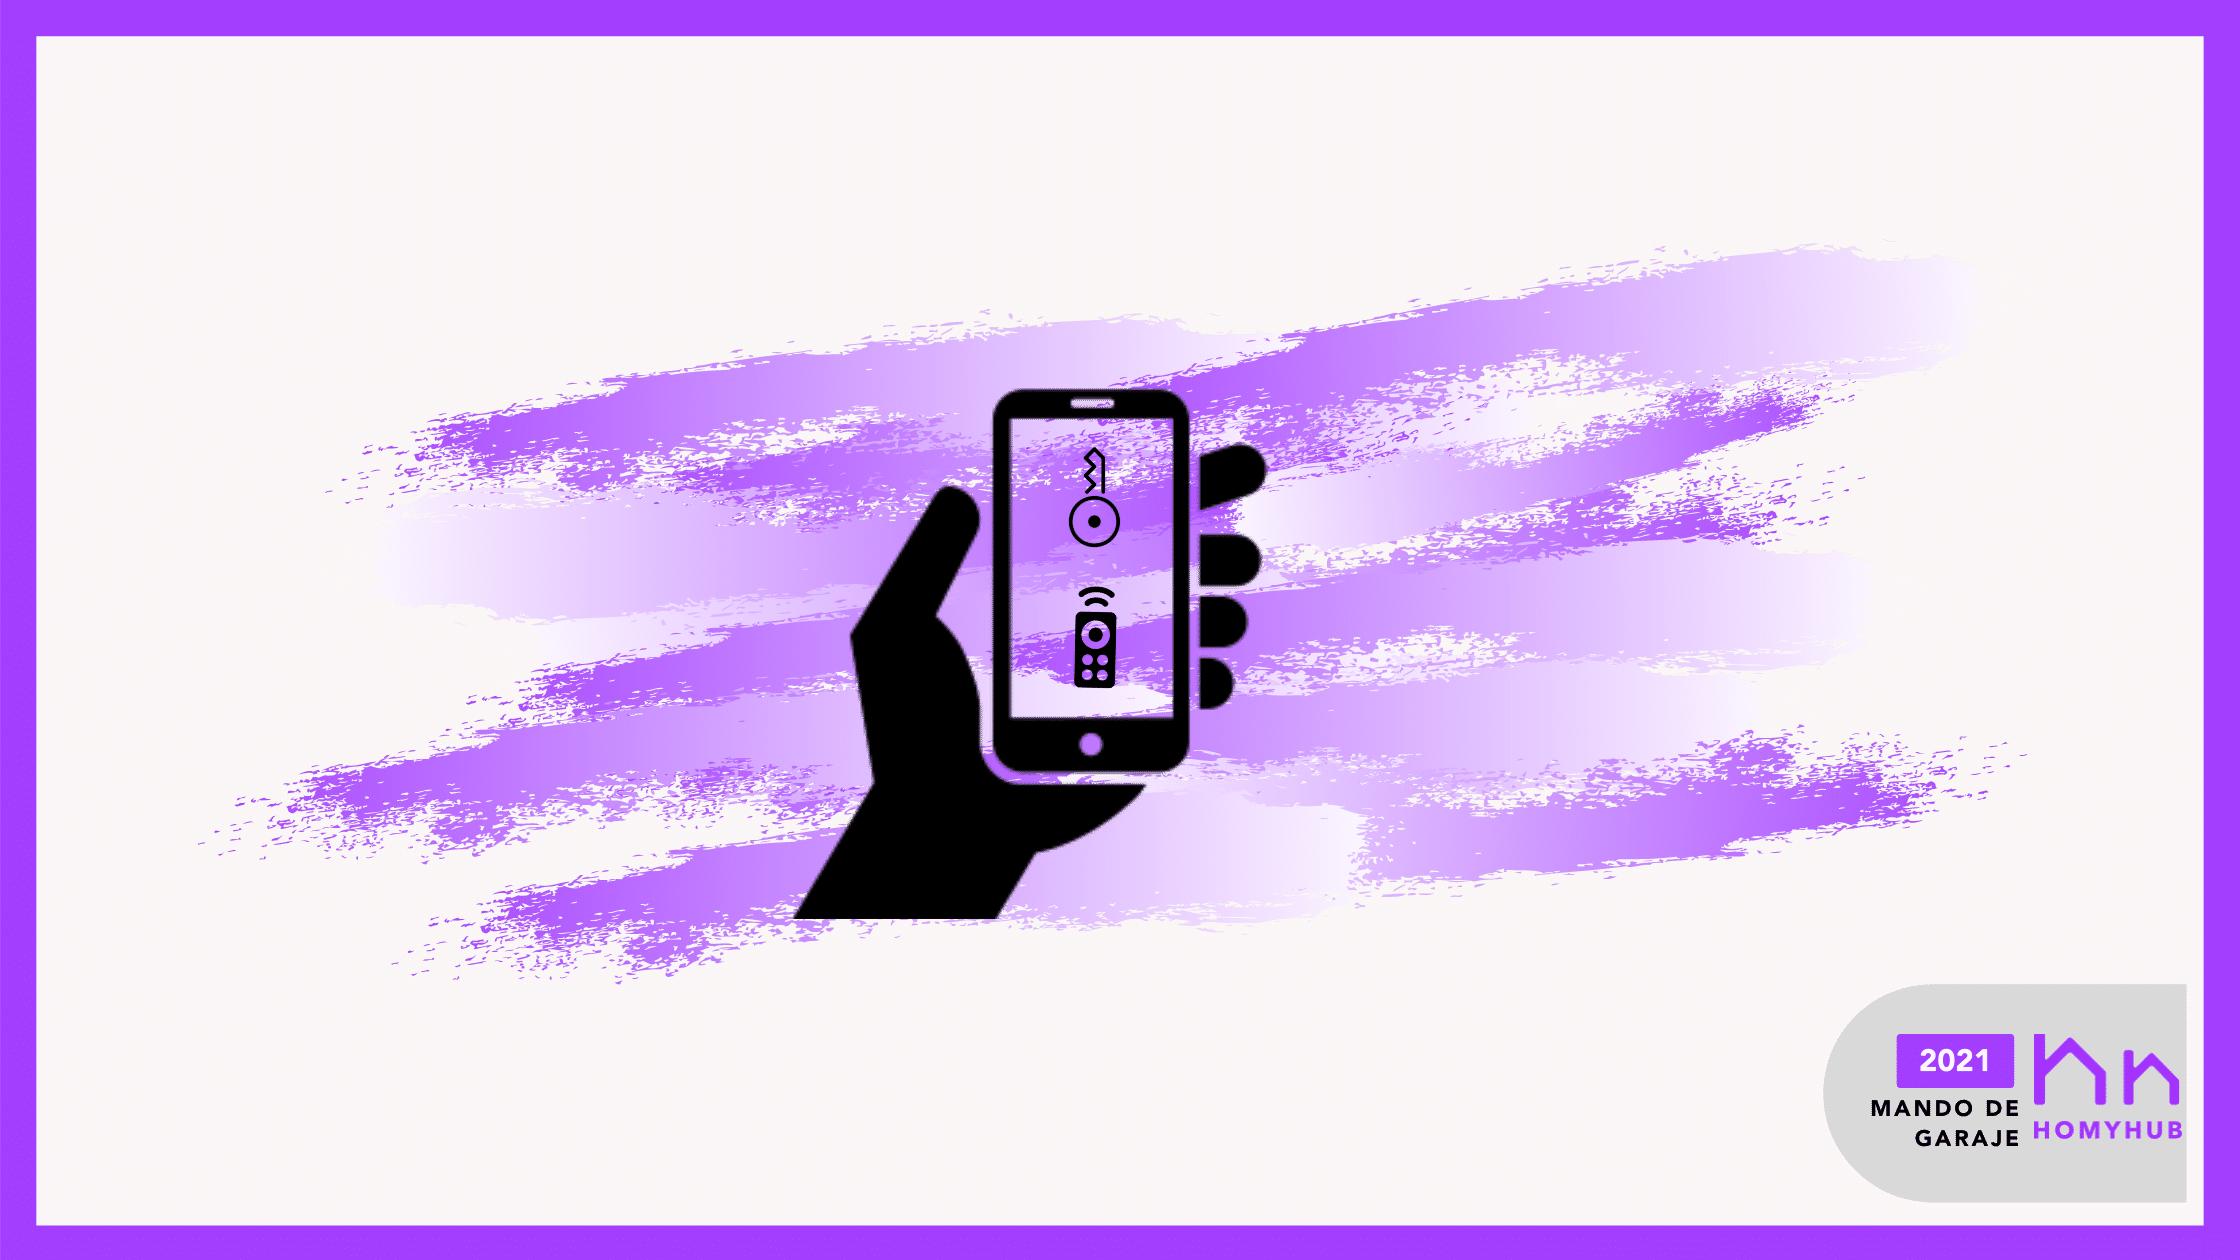 HOMYHUB - Android Mando Garaje